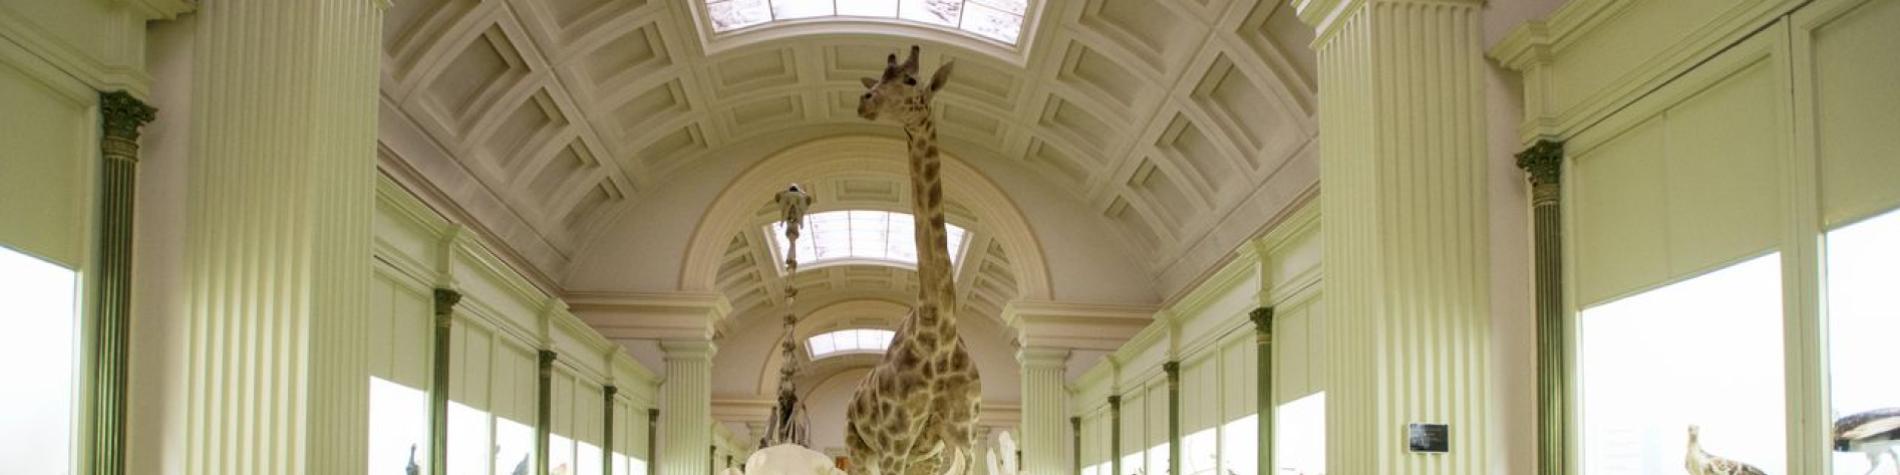 Musée d'Histoire naturelle - vivarium - Tournai - Galerie